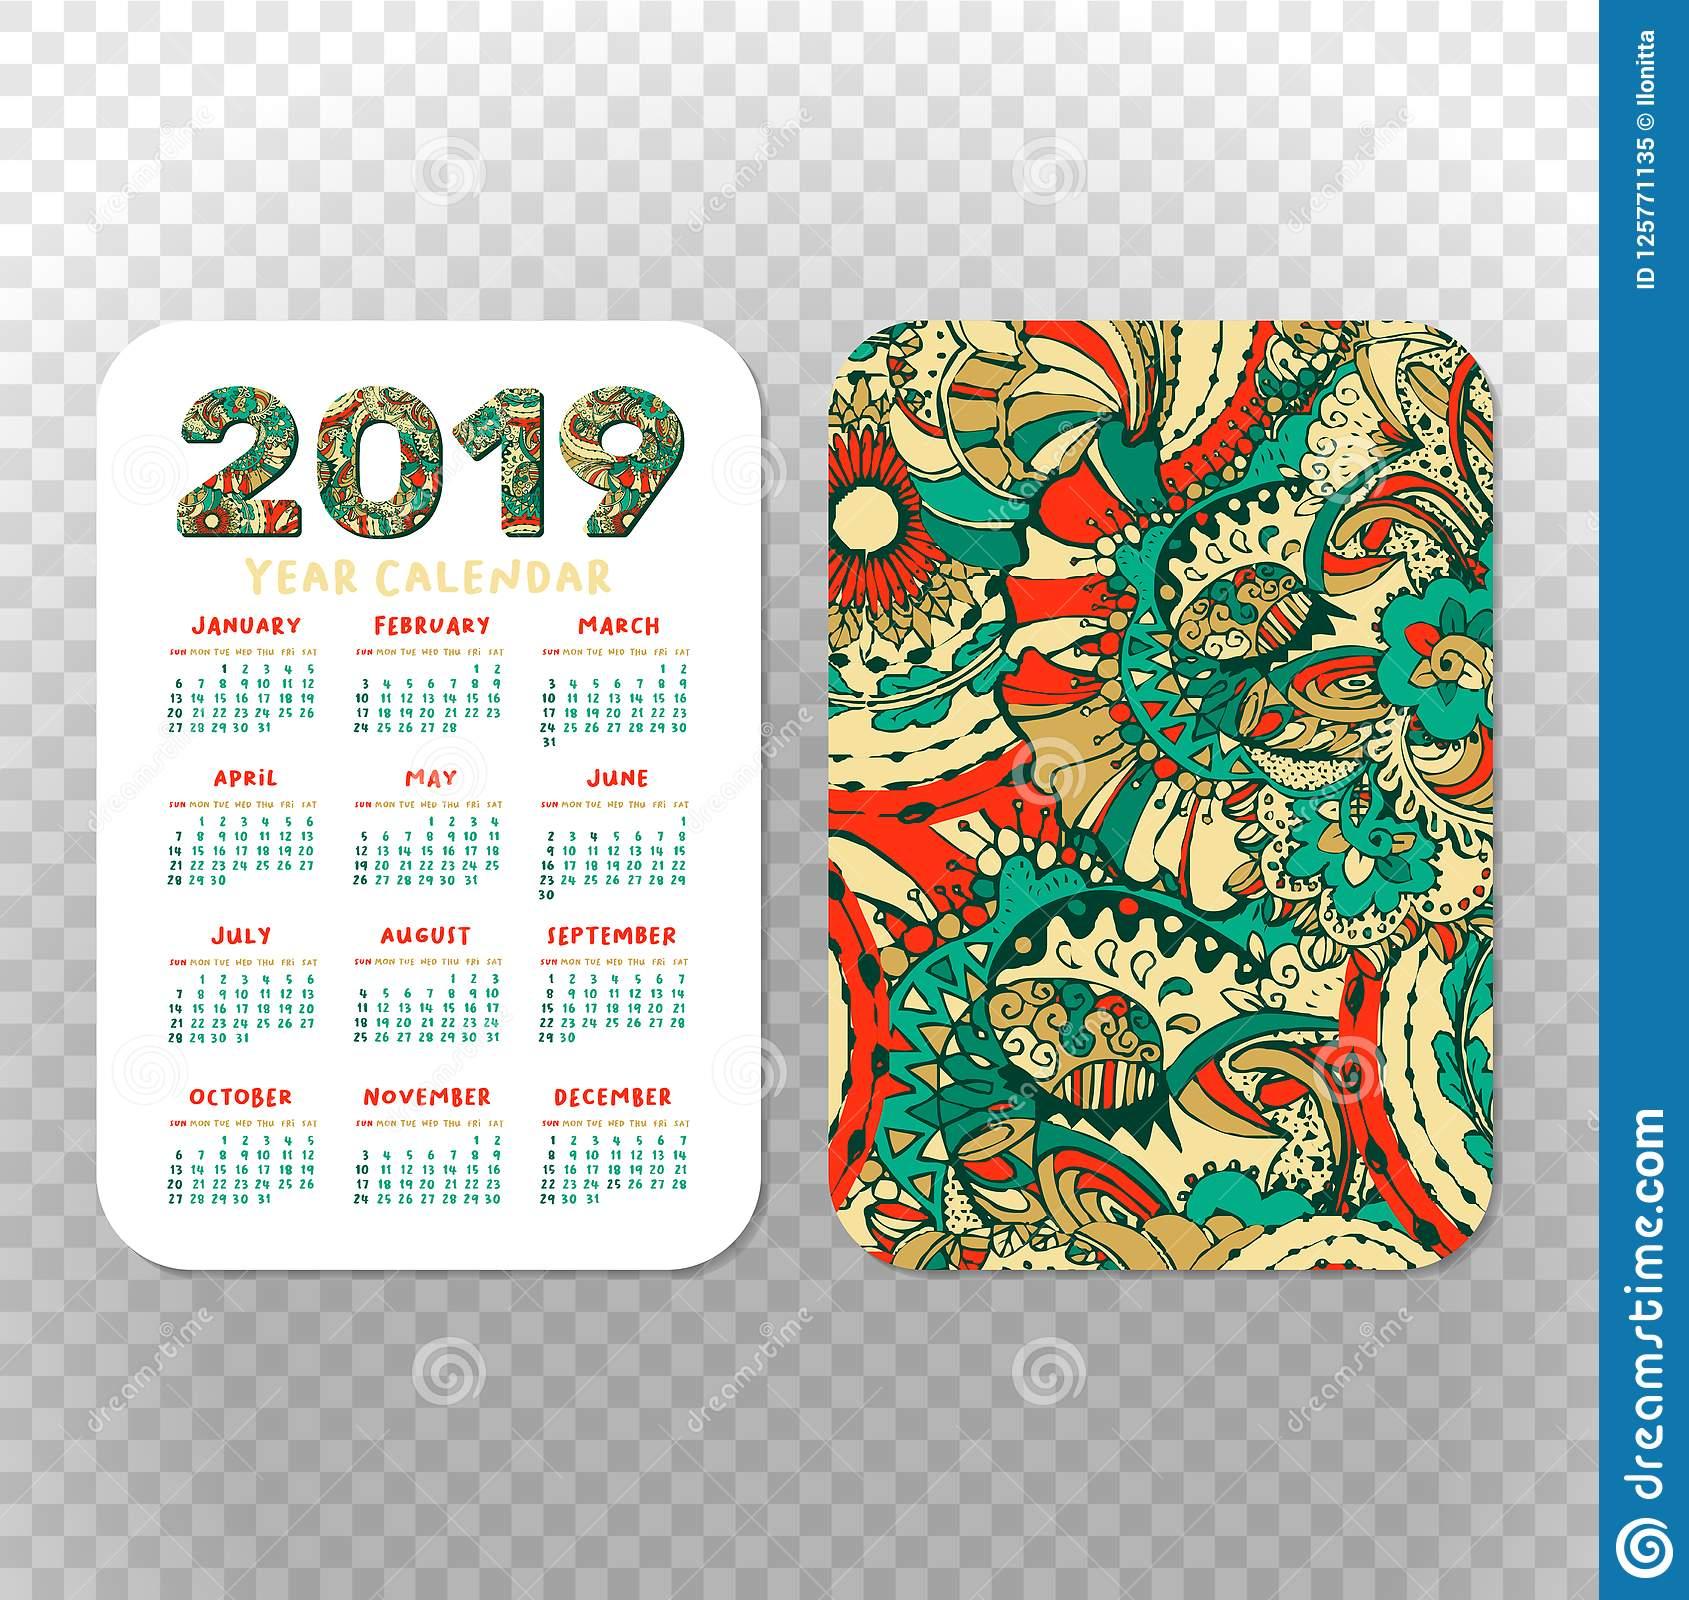 2019 Calendar Template For Pocket Calendar, Basic Grid